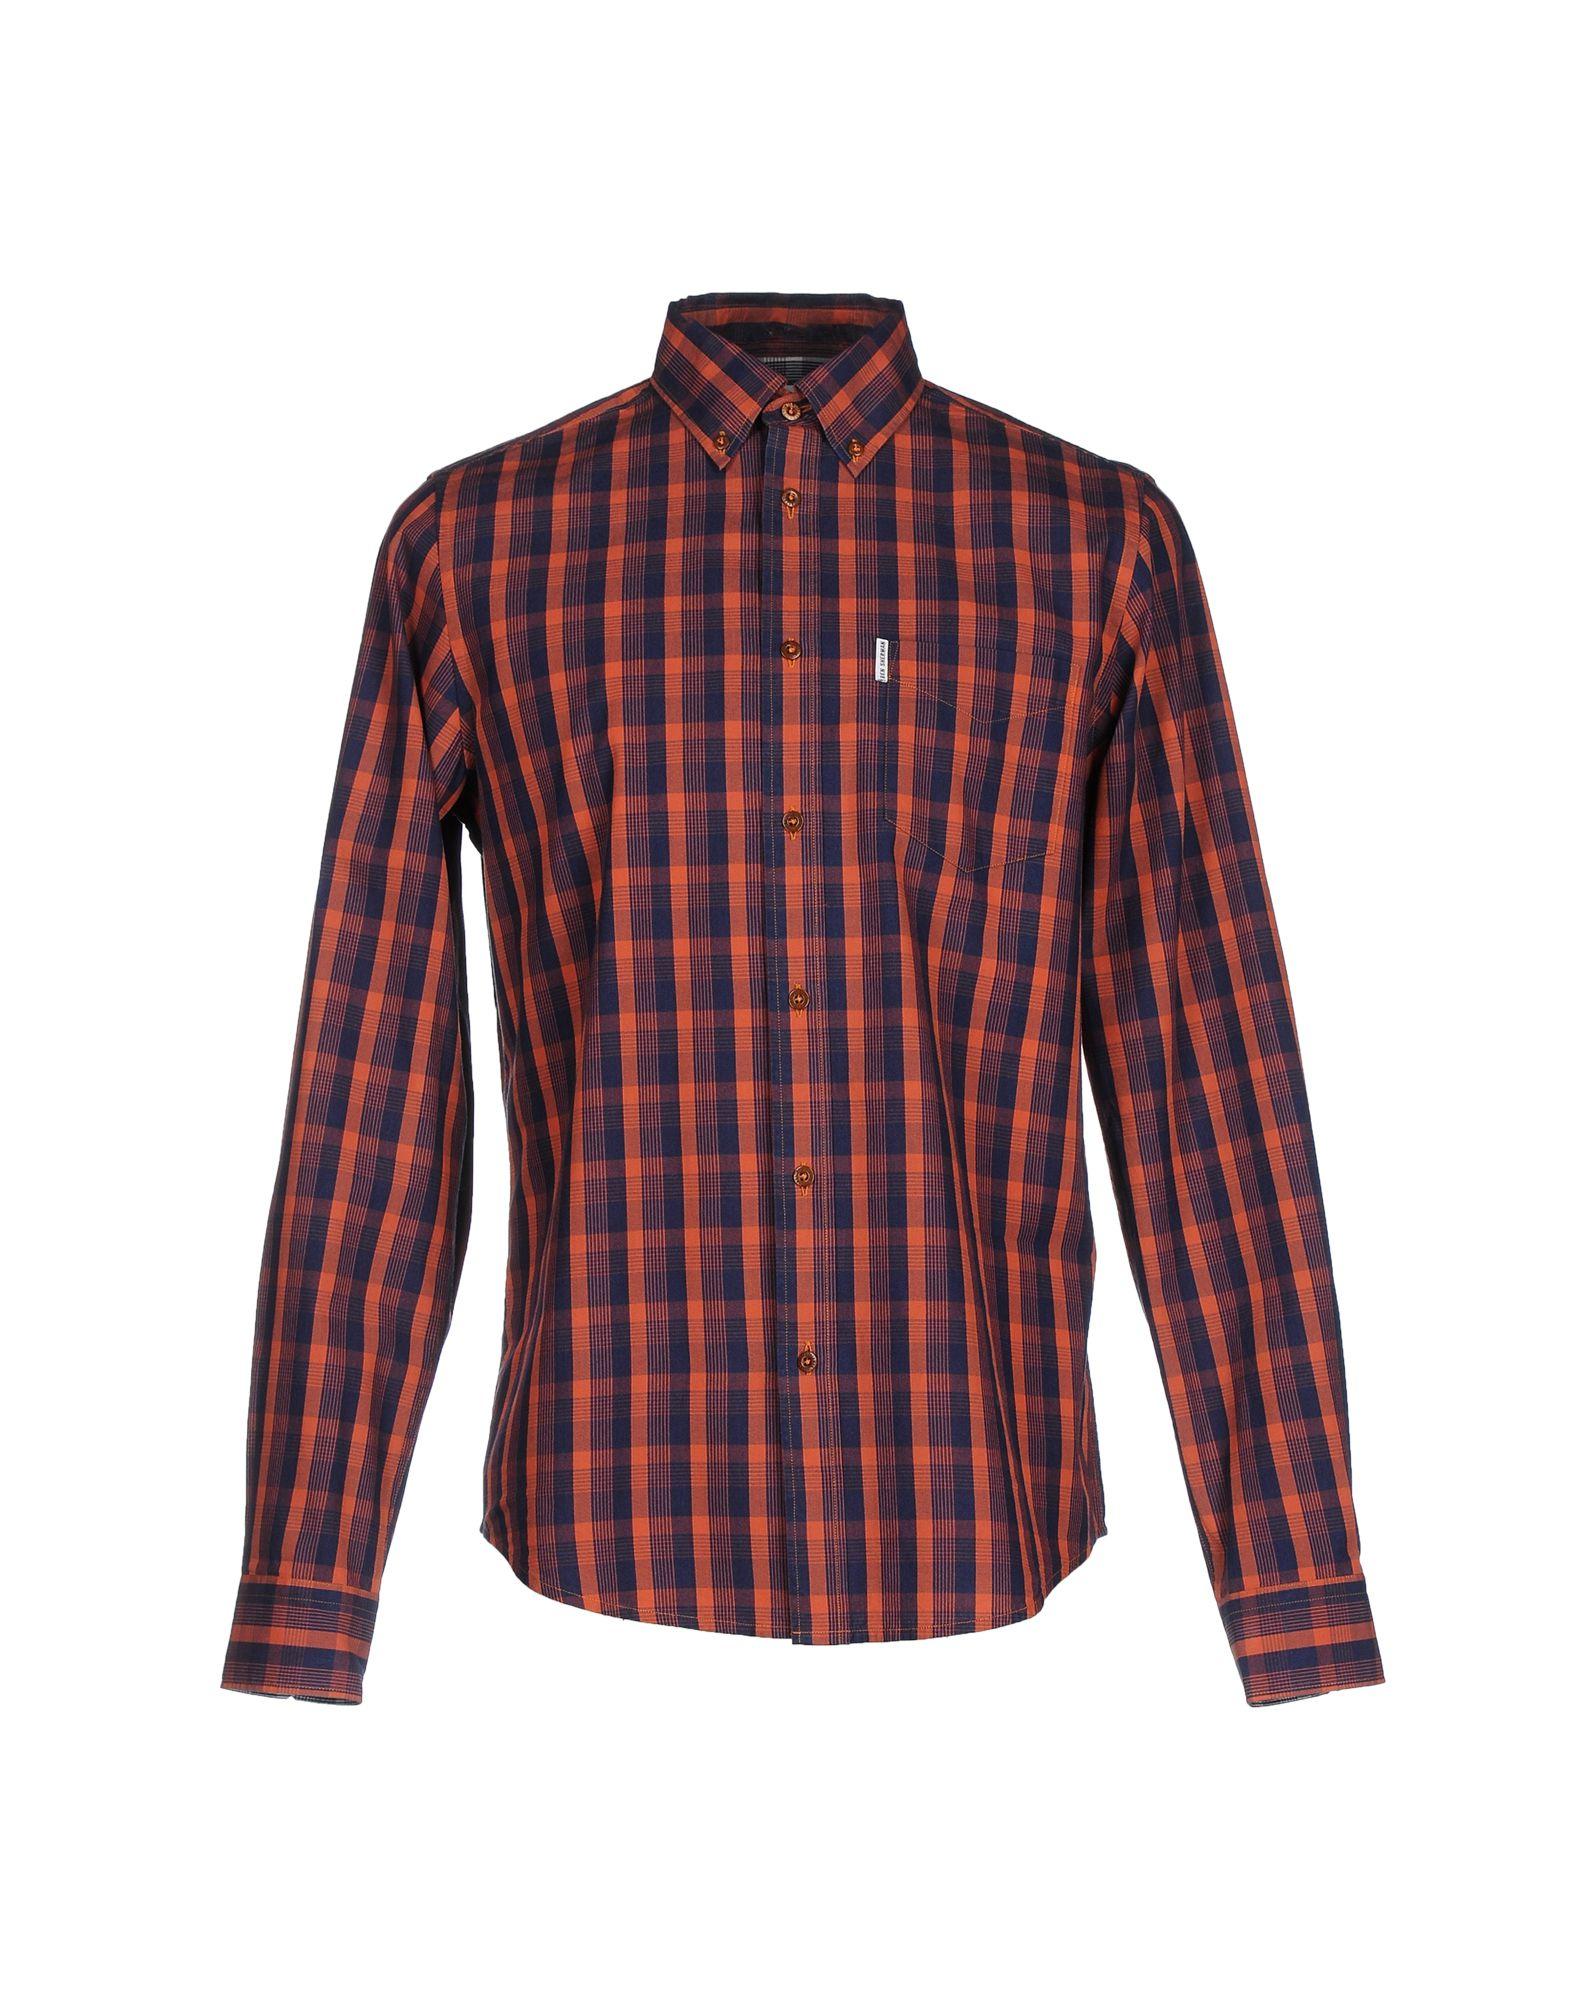 Lyst ben sherman shirt in brown for men for Mens chocolate brown dress shirt